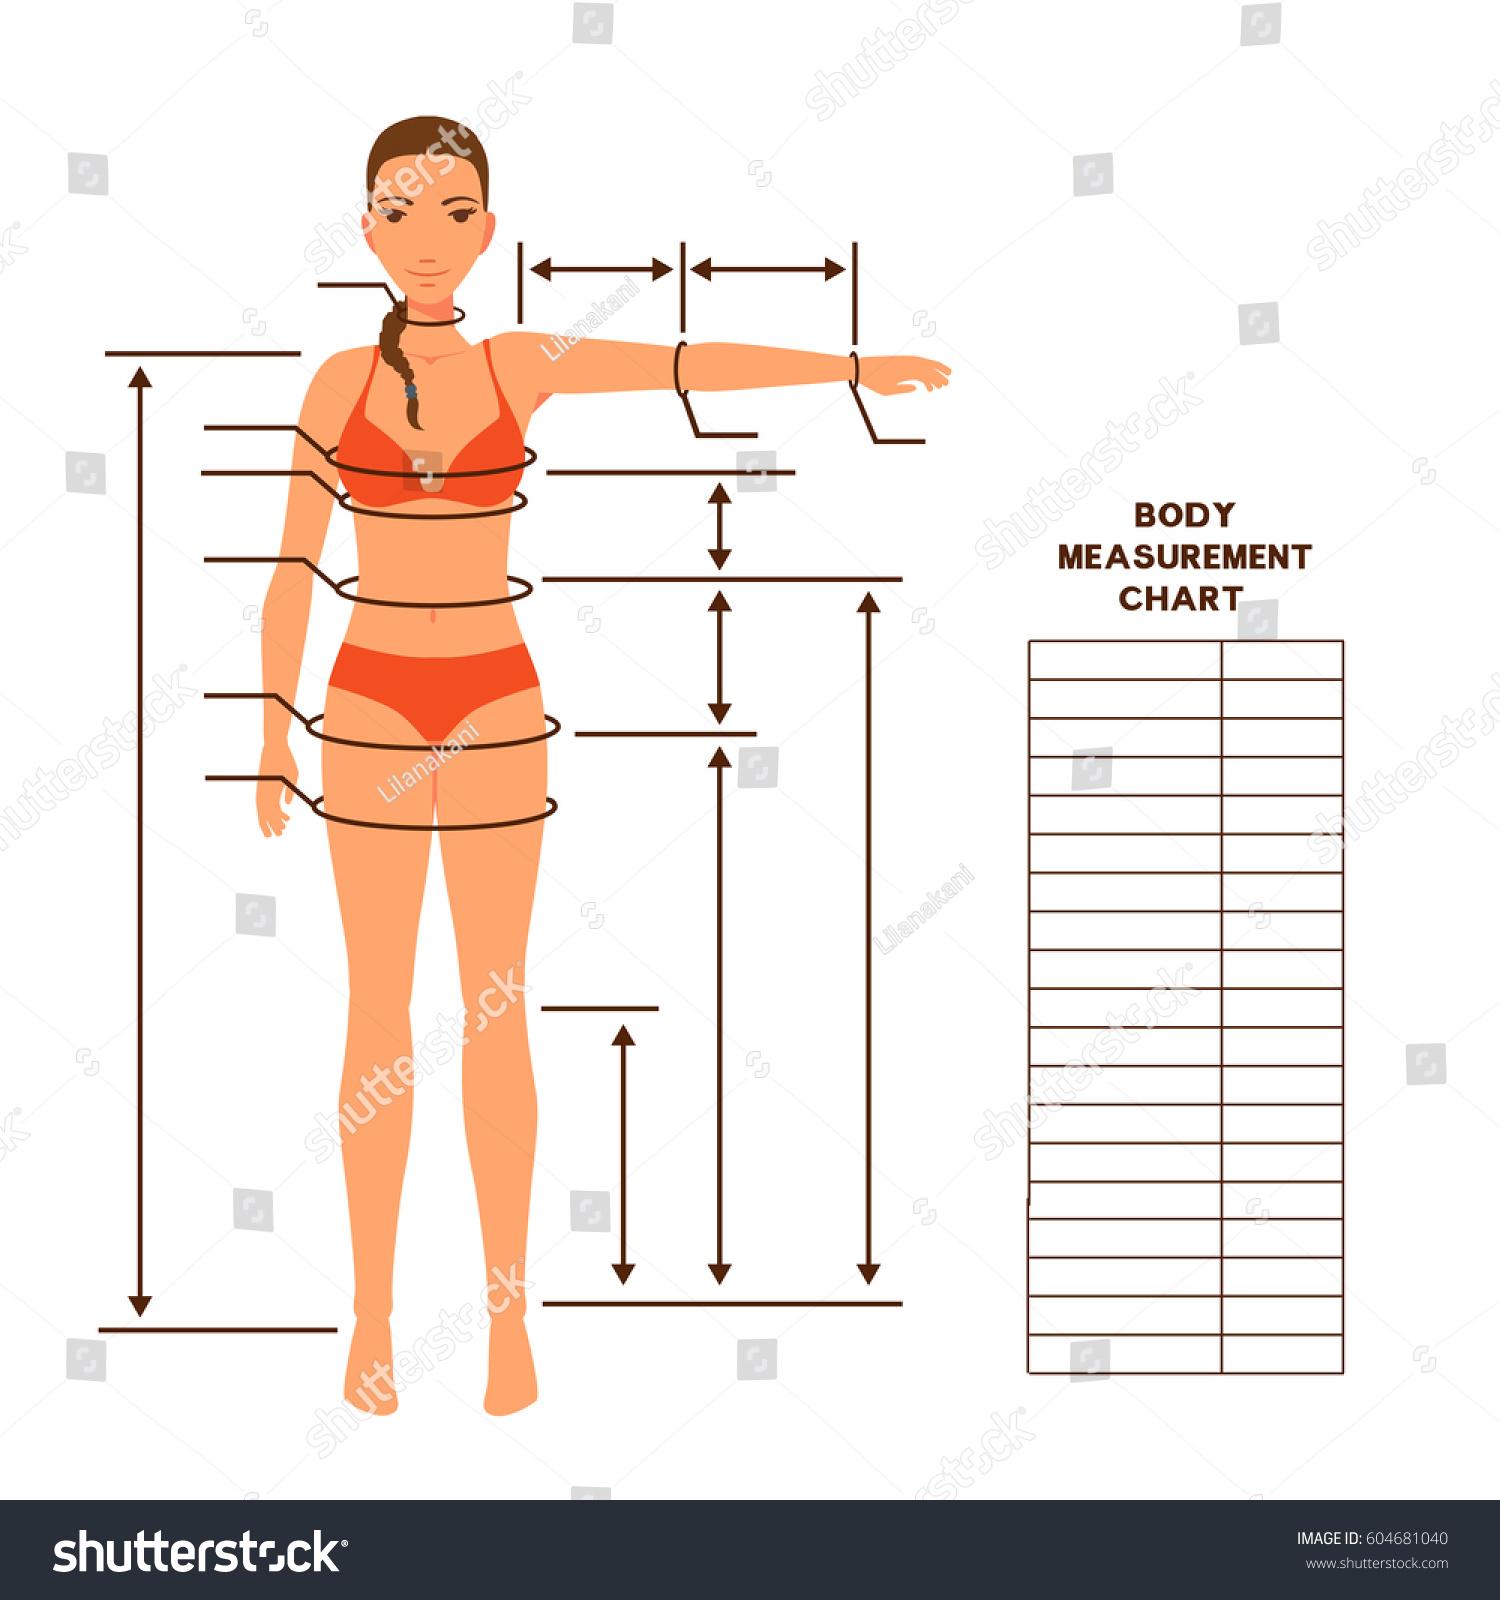 Woman Body Measurement Chart Scheme Measurement Stock Vector ...